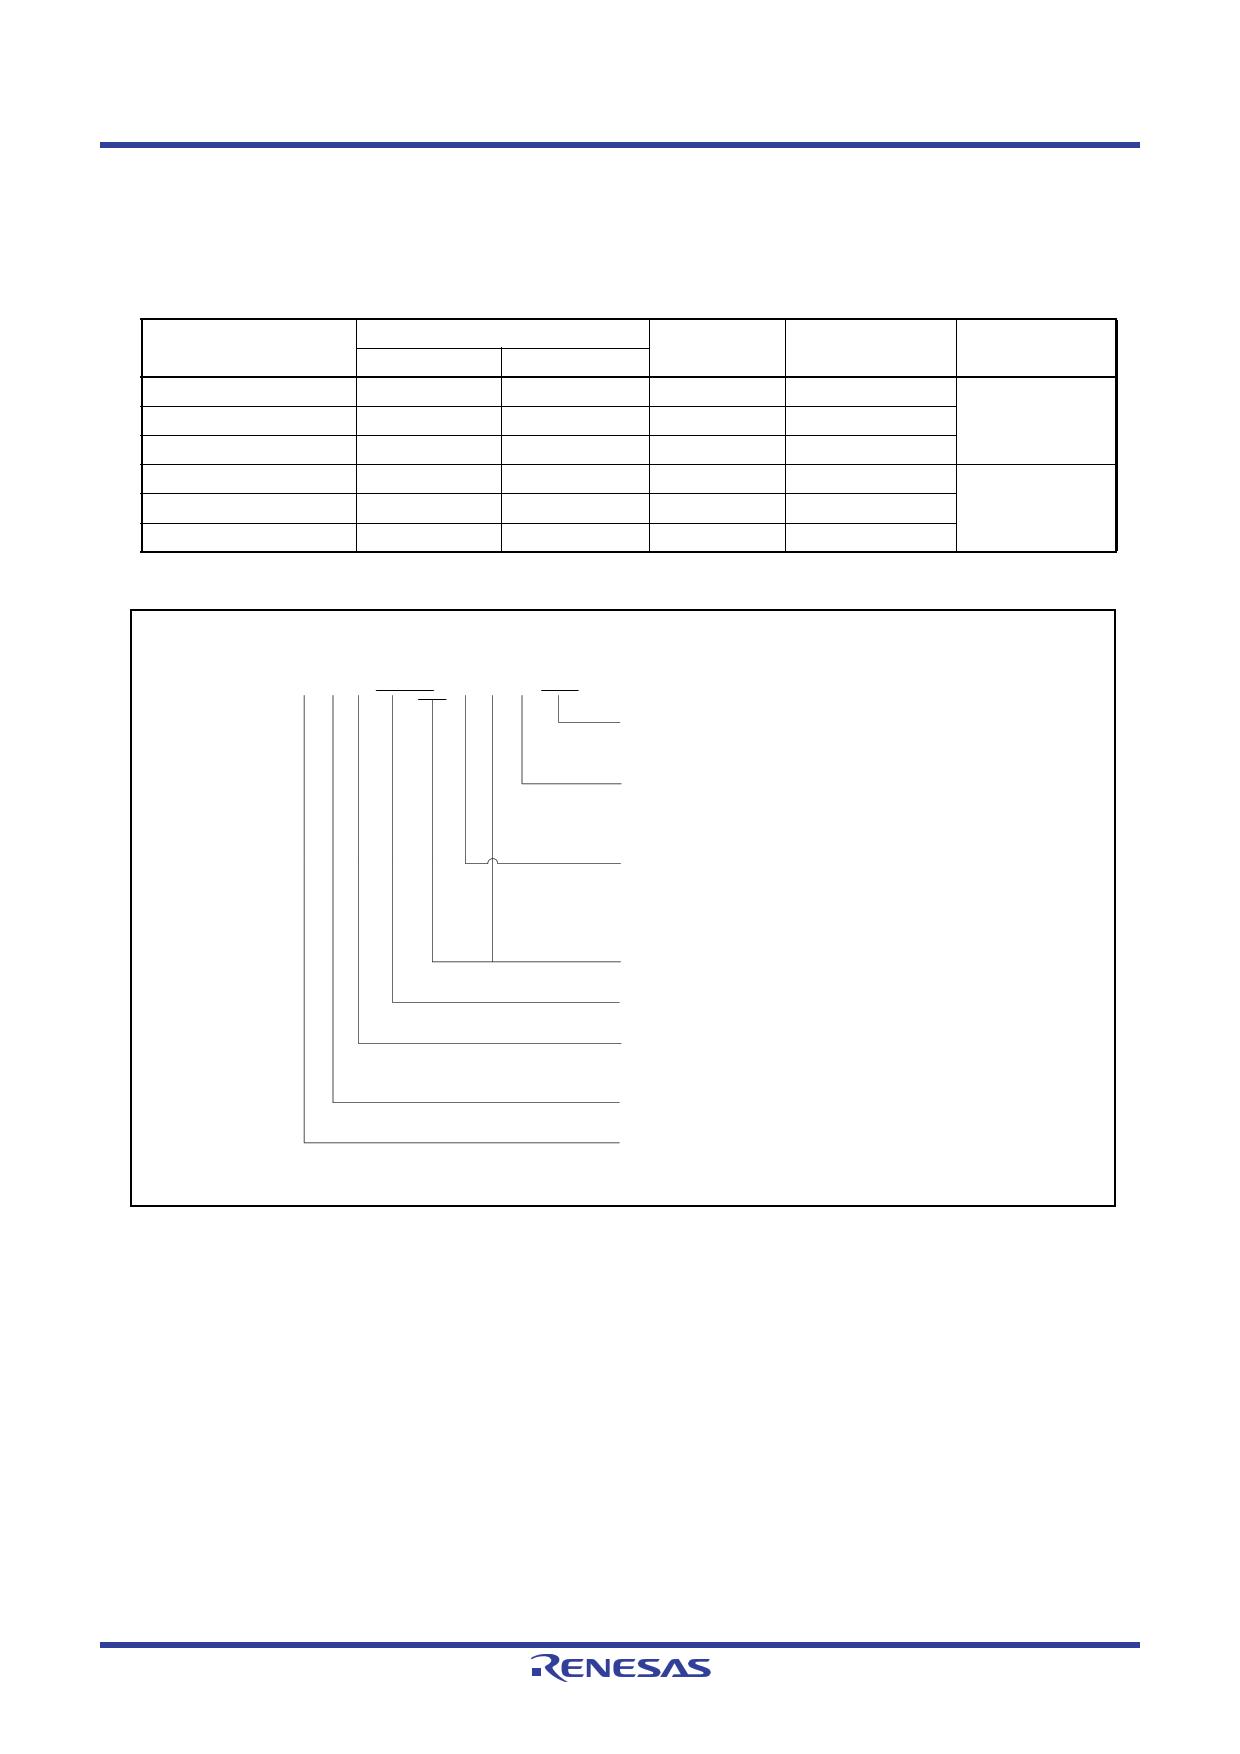 R5F21344CNFP pdf, 반도체, 판매, 대치품